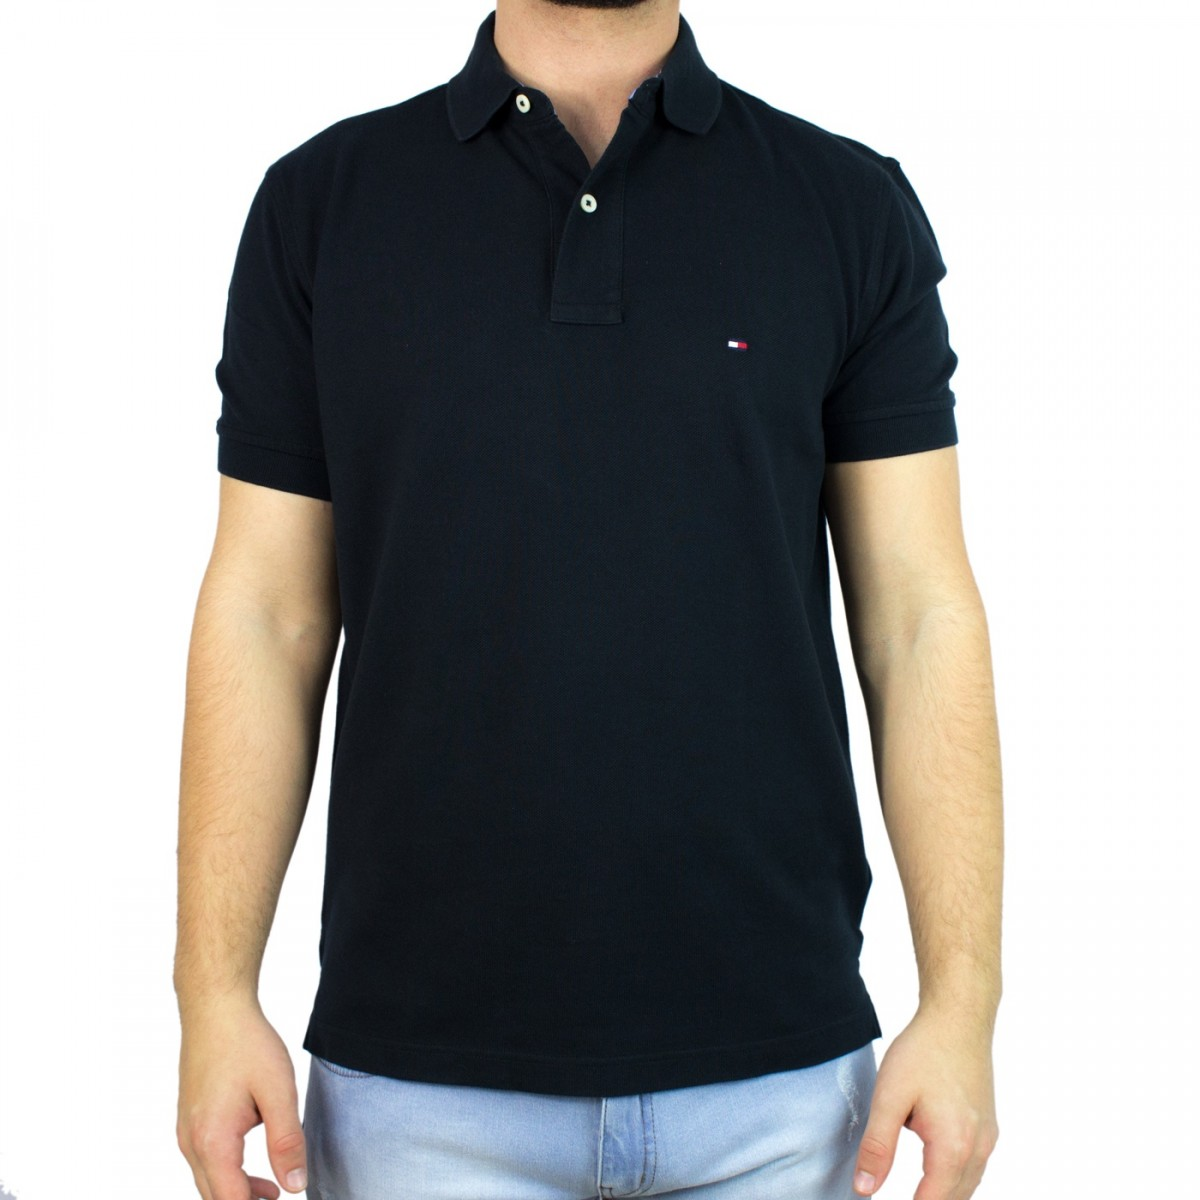 791d775919 Bizz Store - Camisa Polo Masculina Tommy Hilfiger Preta